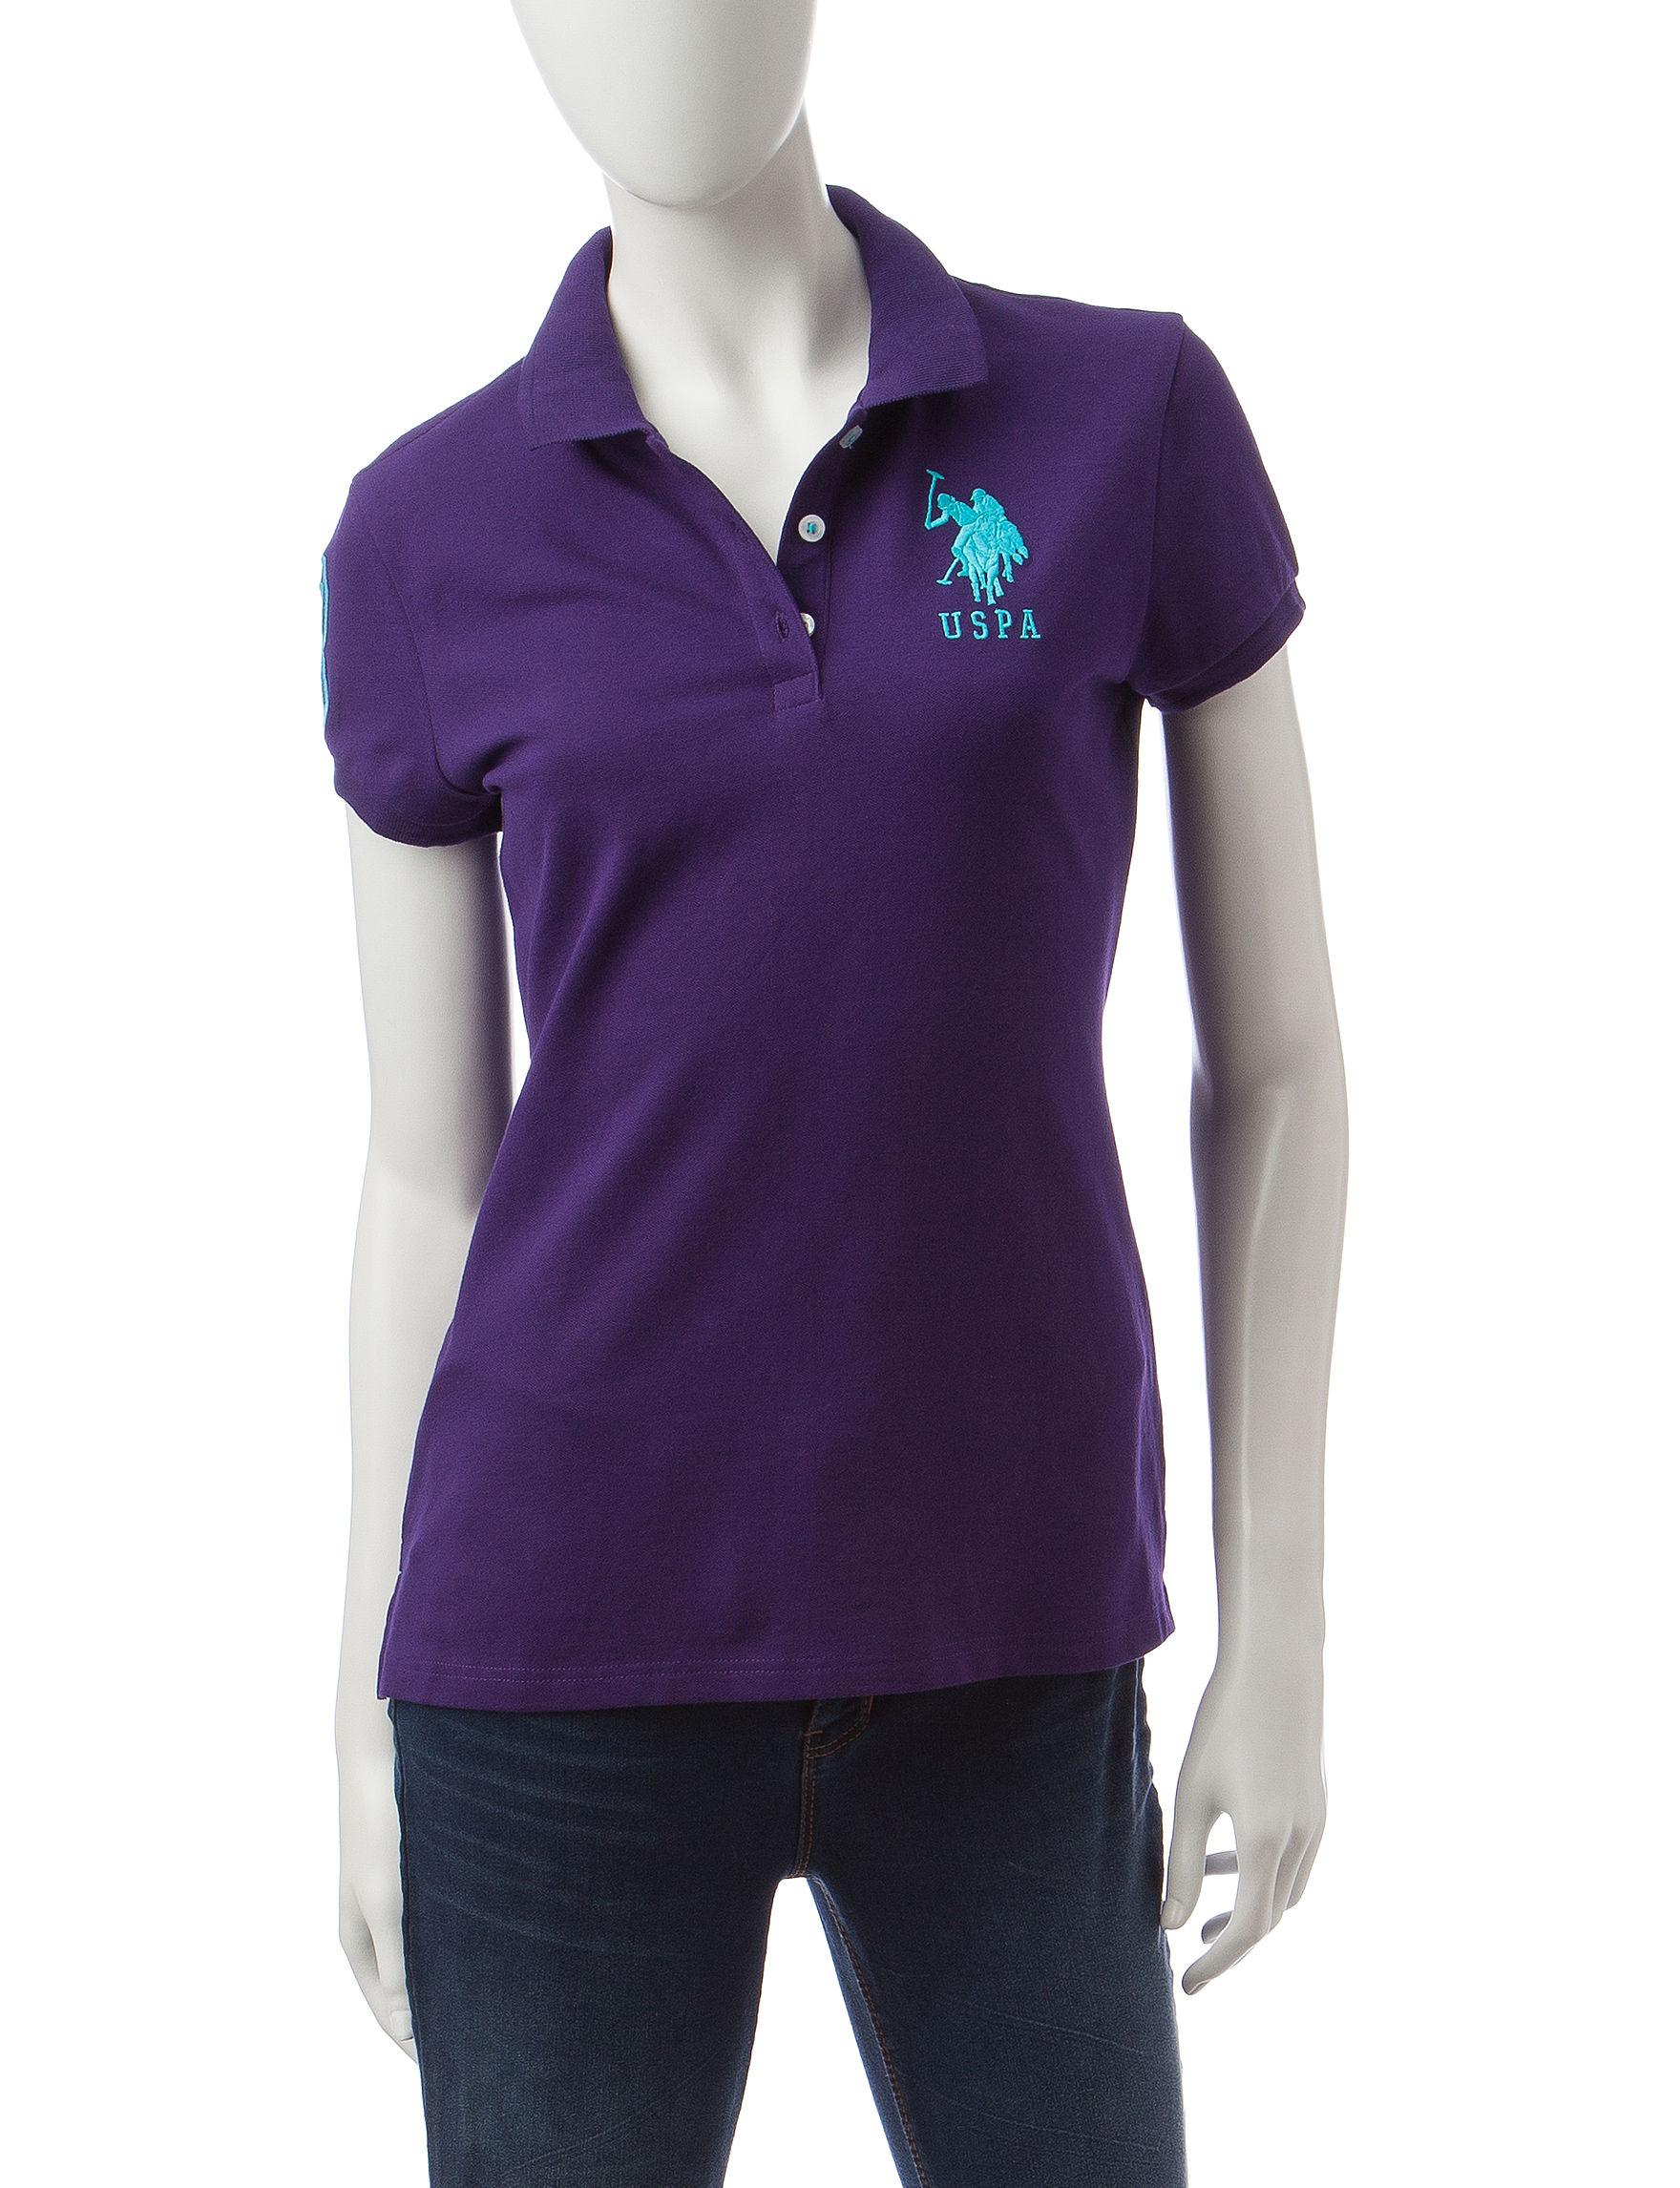 U.S. Polo Assn. Purple Polos